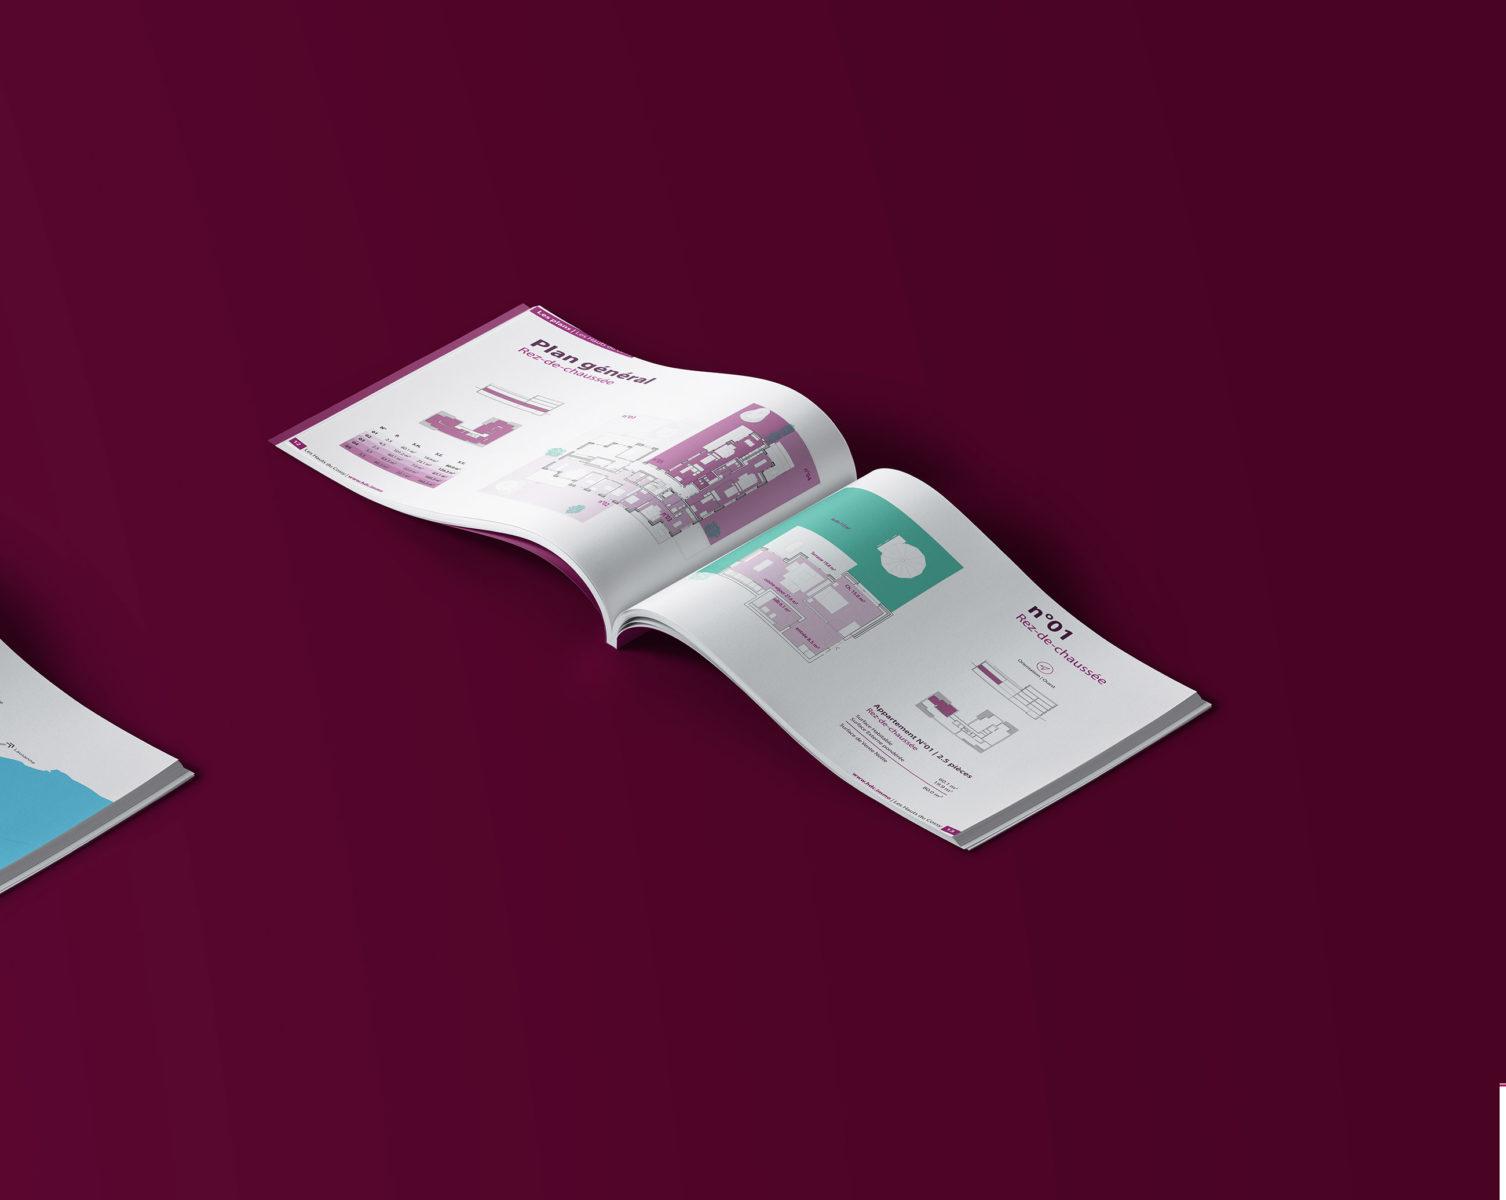 PRESENTATION-Steiner-HDC-IMMObilier-graphiste-promotion-agence-comminication-vente-immeuble-nyon-geneve-graphisme-lausanne-brochure-plaquette